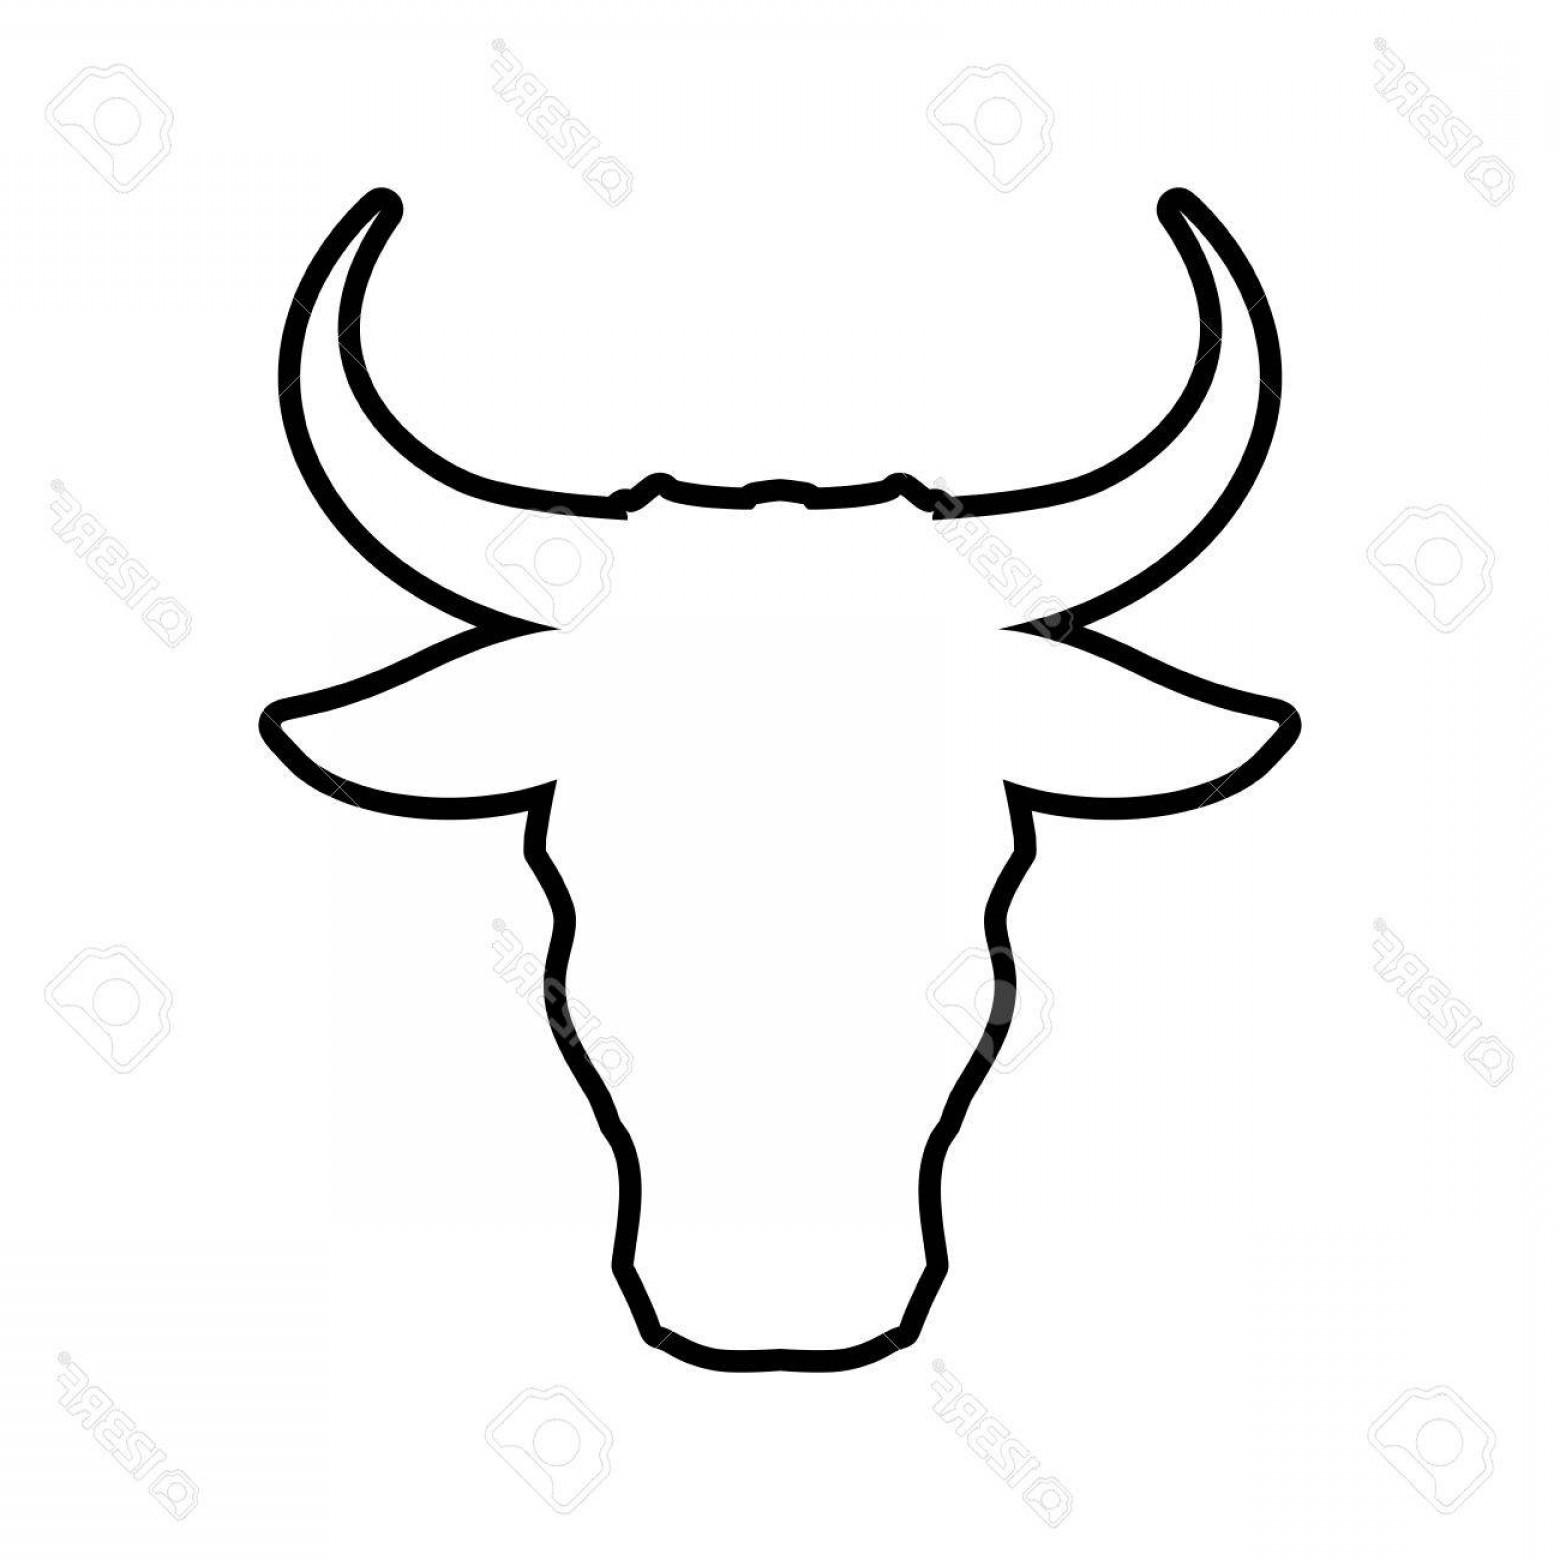 1560x1560 Chicago Bulls Vector Graphics Sohadacouri